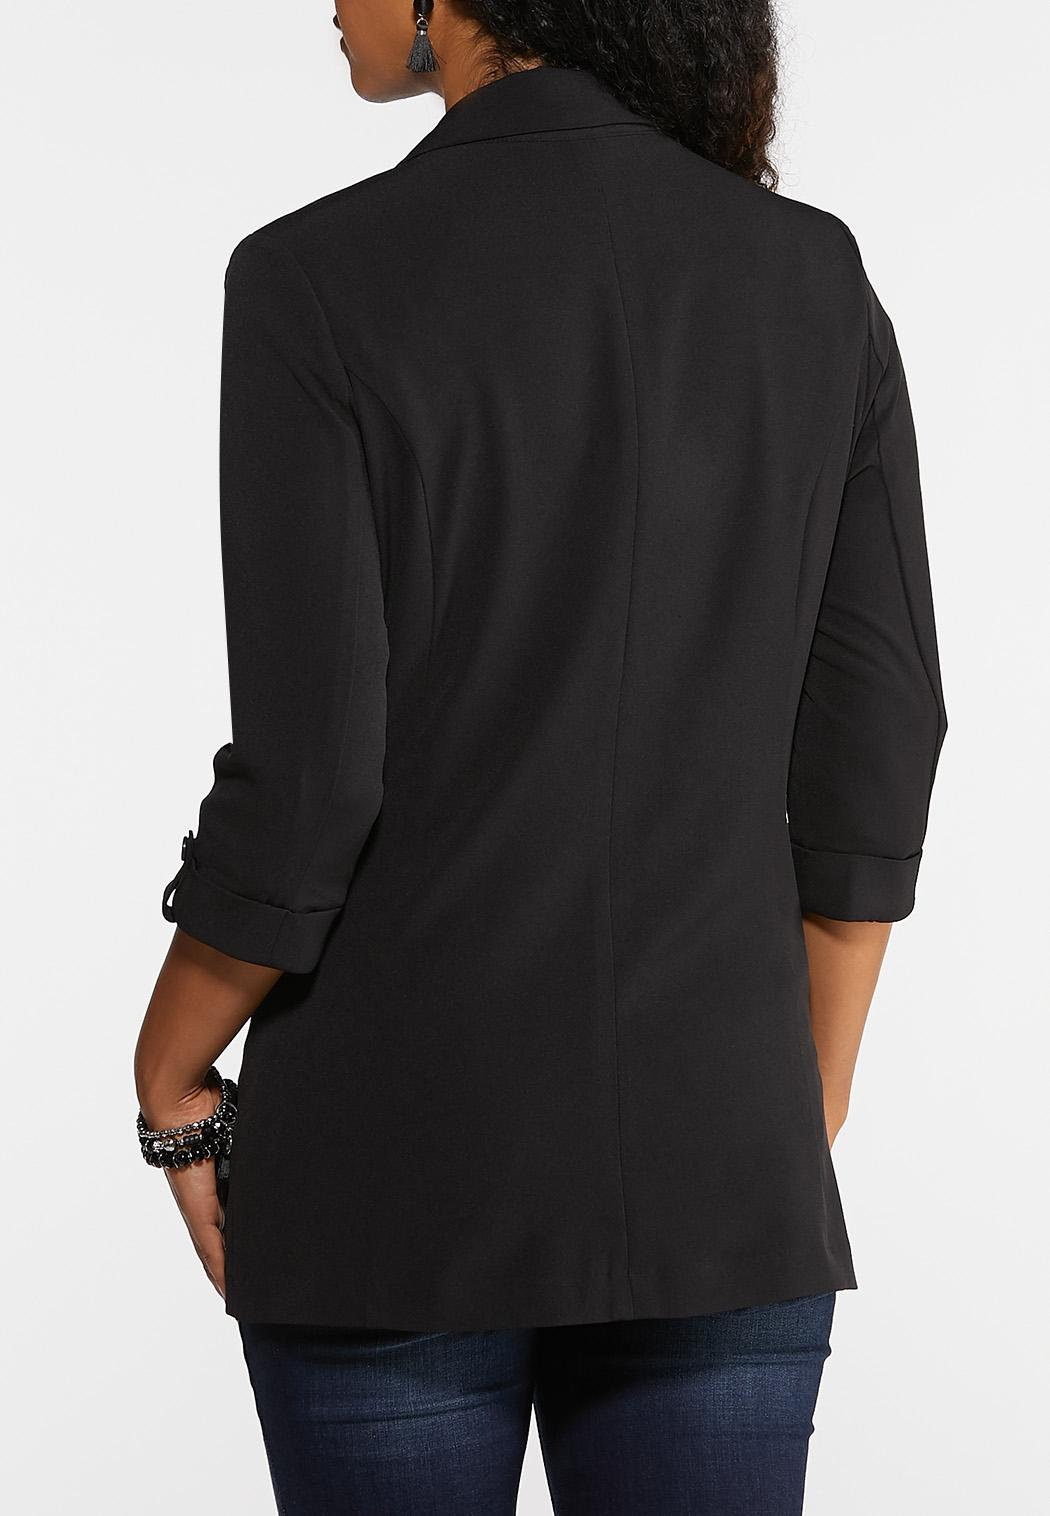 Classic Black Blazer (Item #43927211)